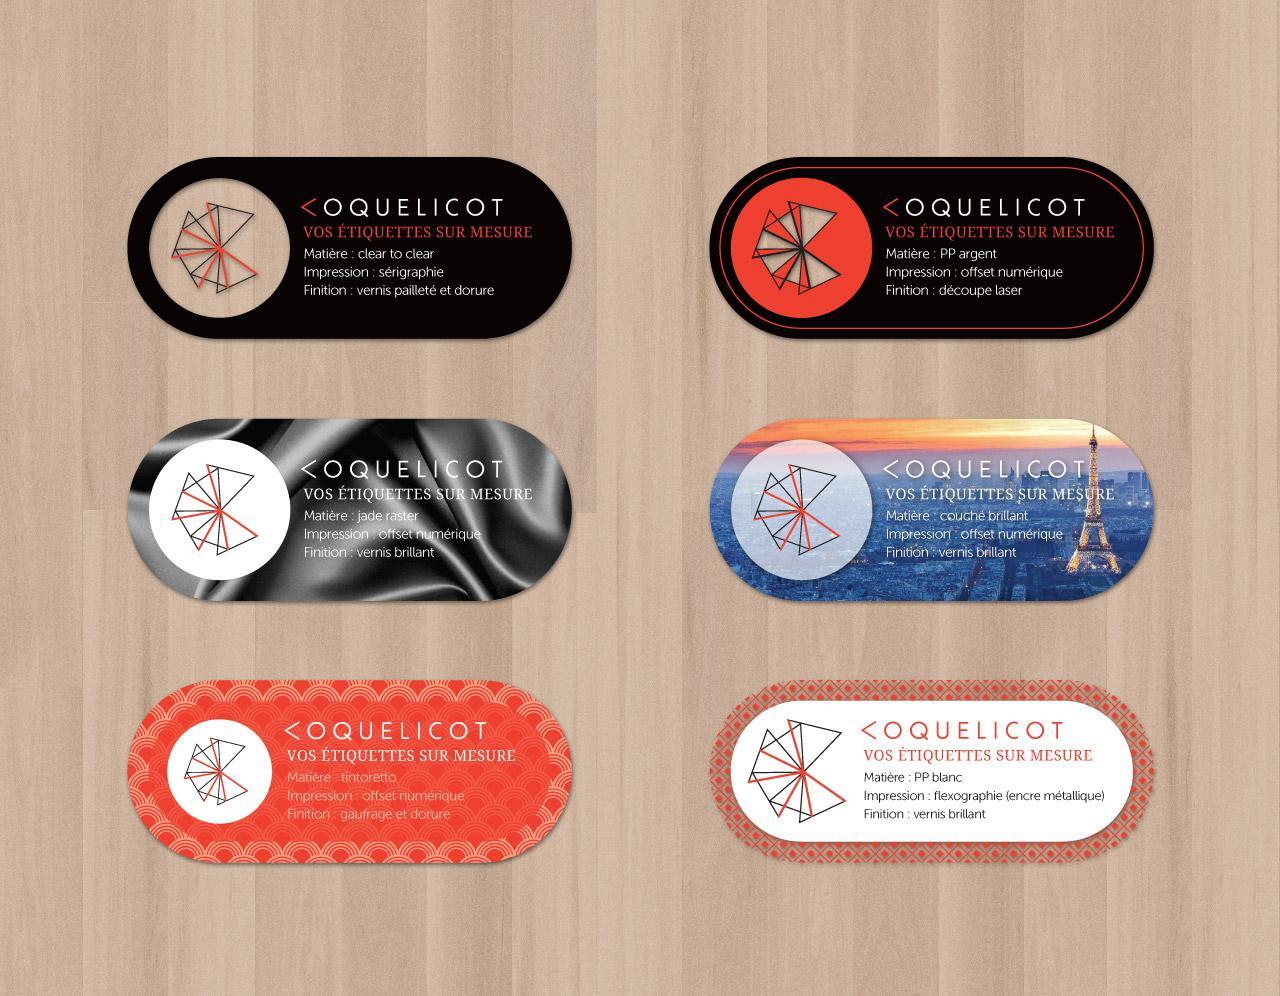 coquelicot-creation-etiquettes-adhesives-1-communication-caconcept-alexis-cretin-graphiste